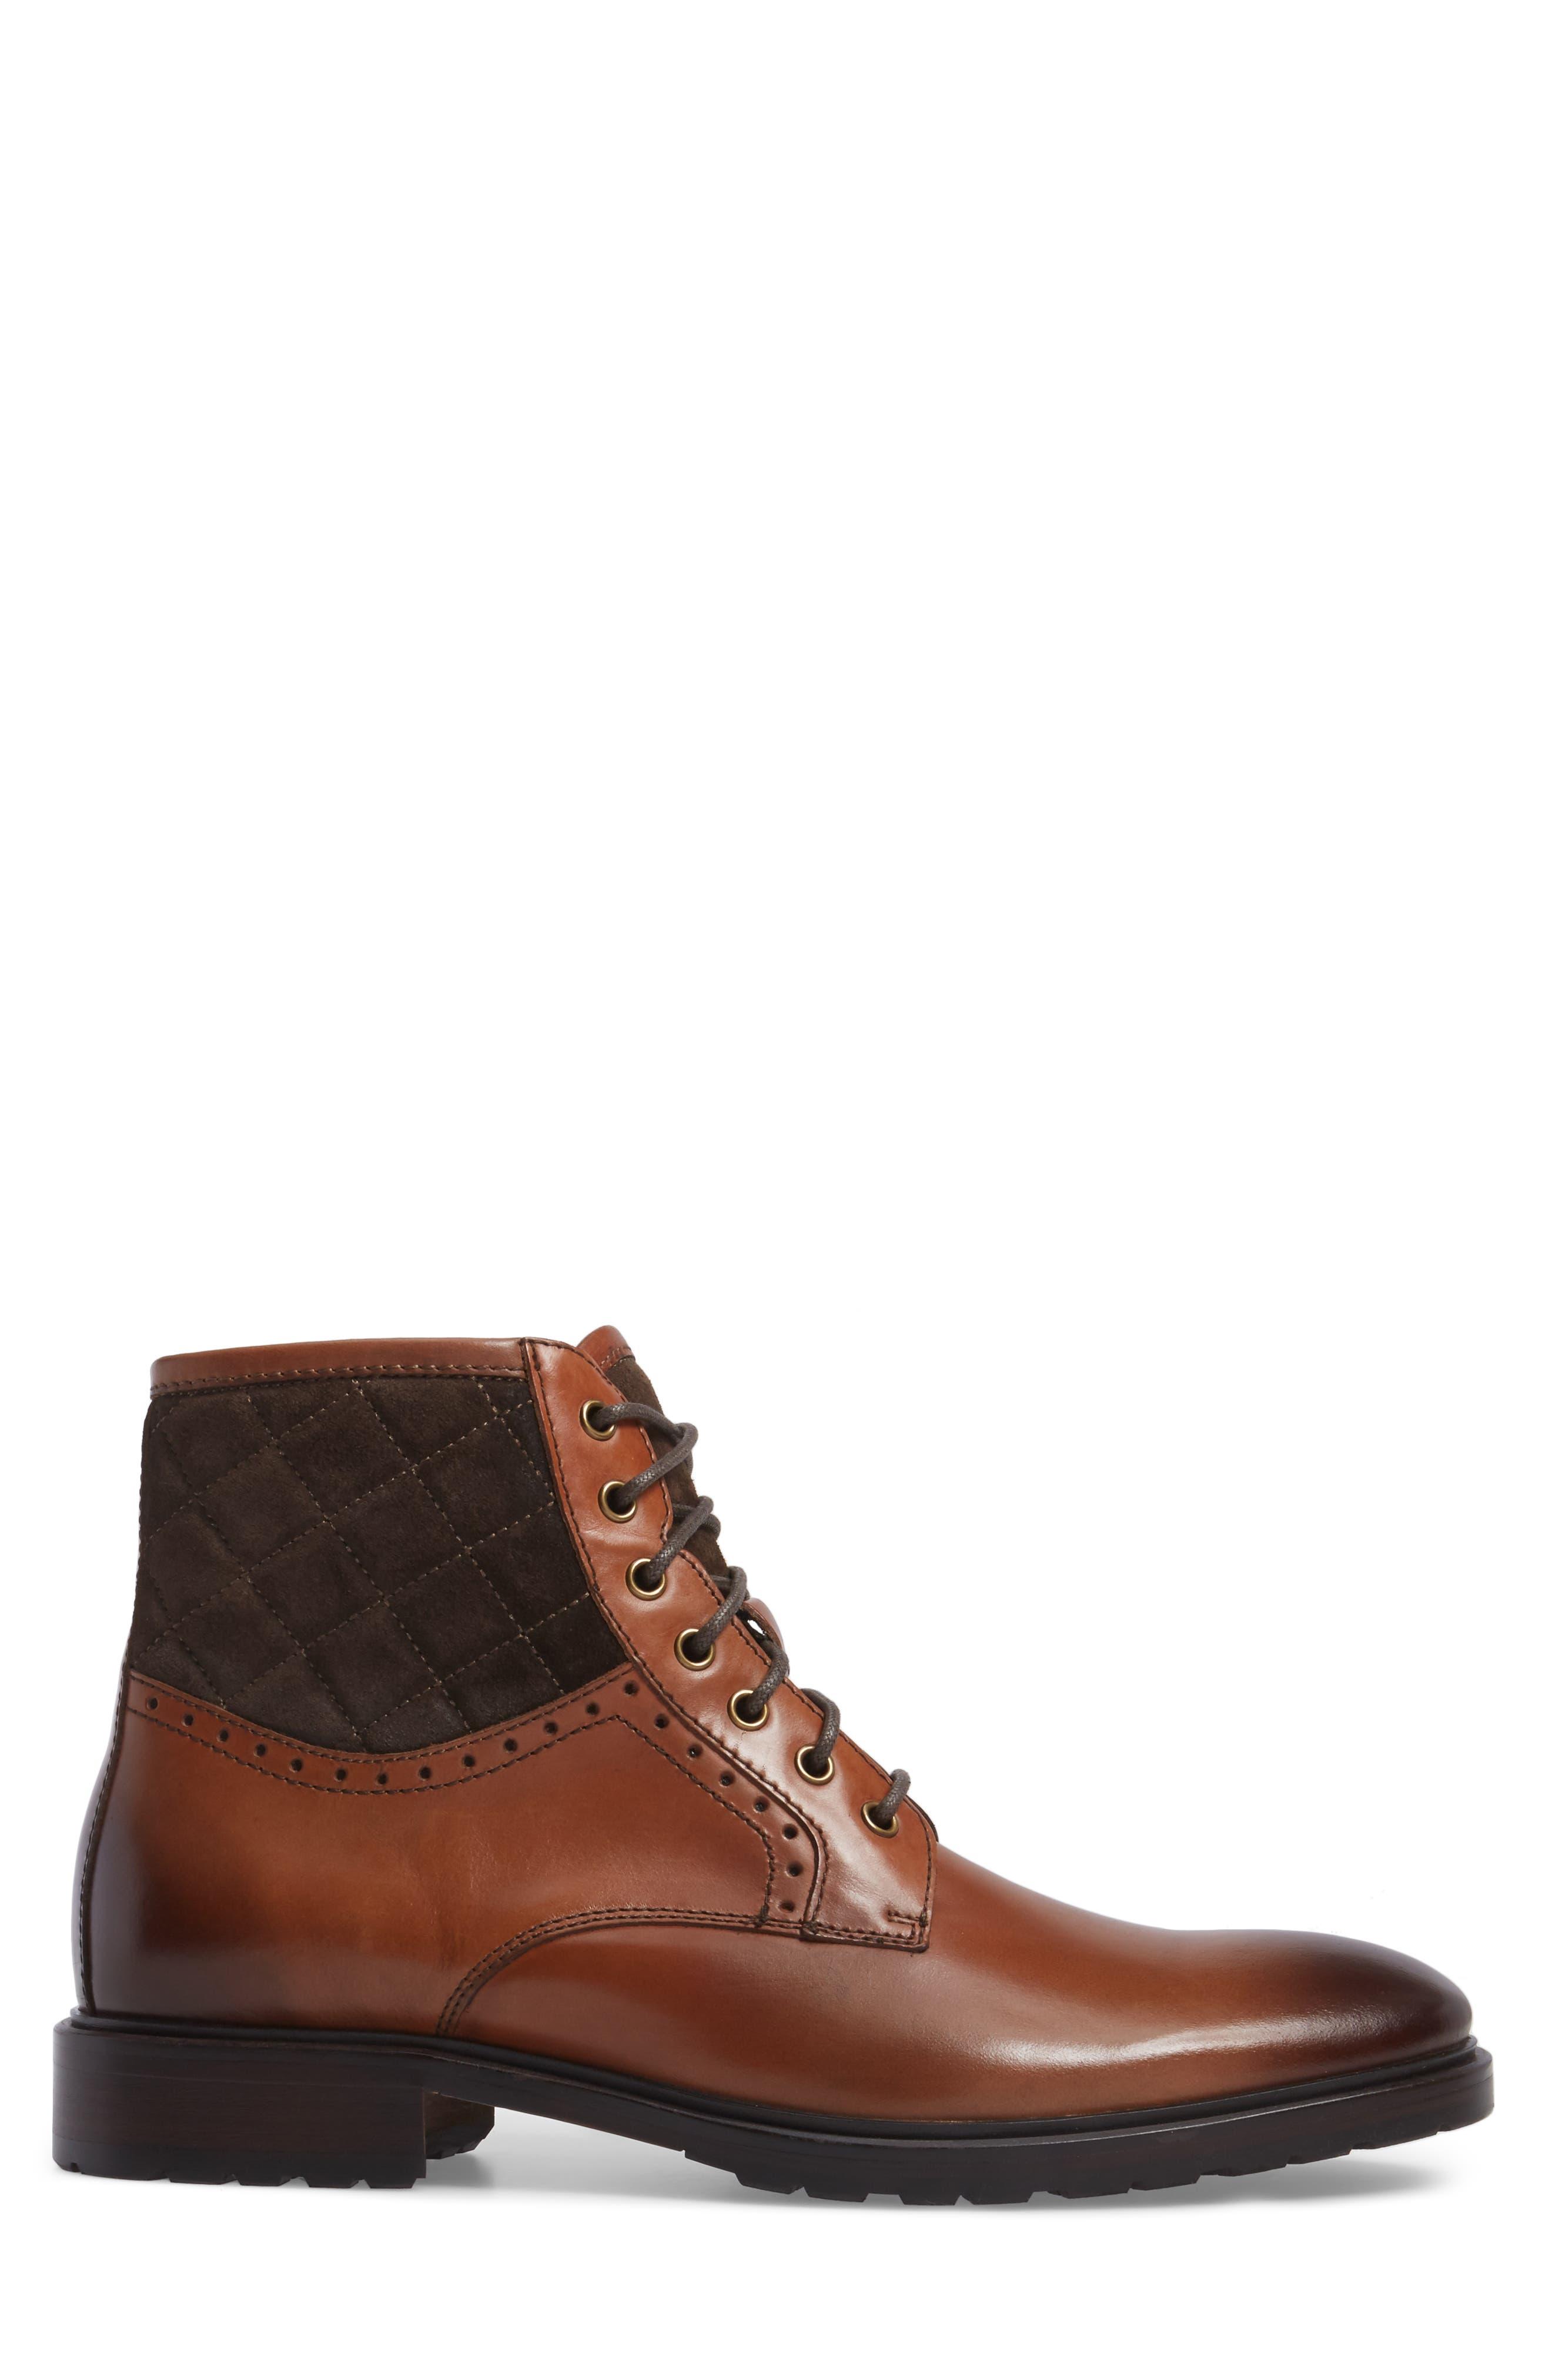 Alternate Image 3  - J&M 1850 Myles Plain Toe Boot (Men)